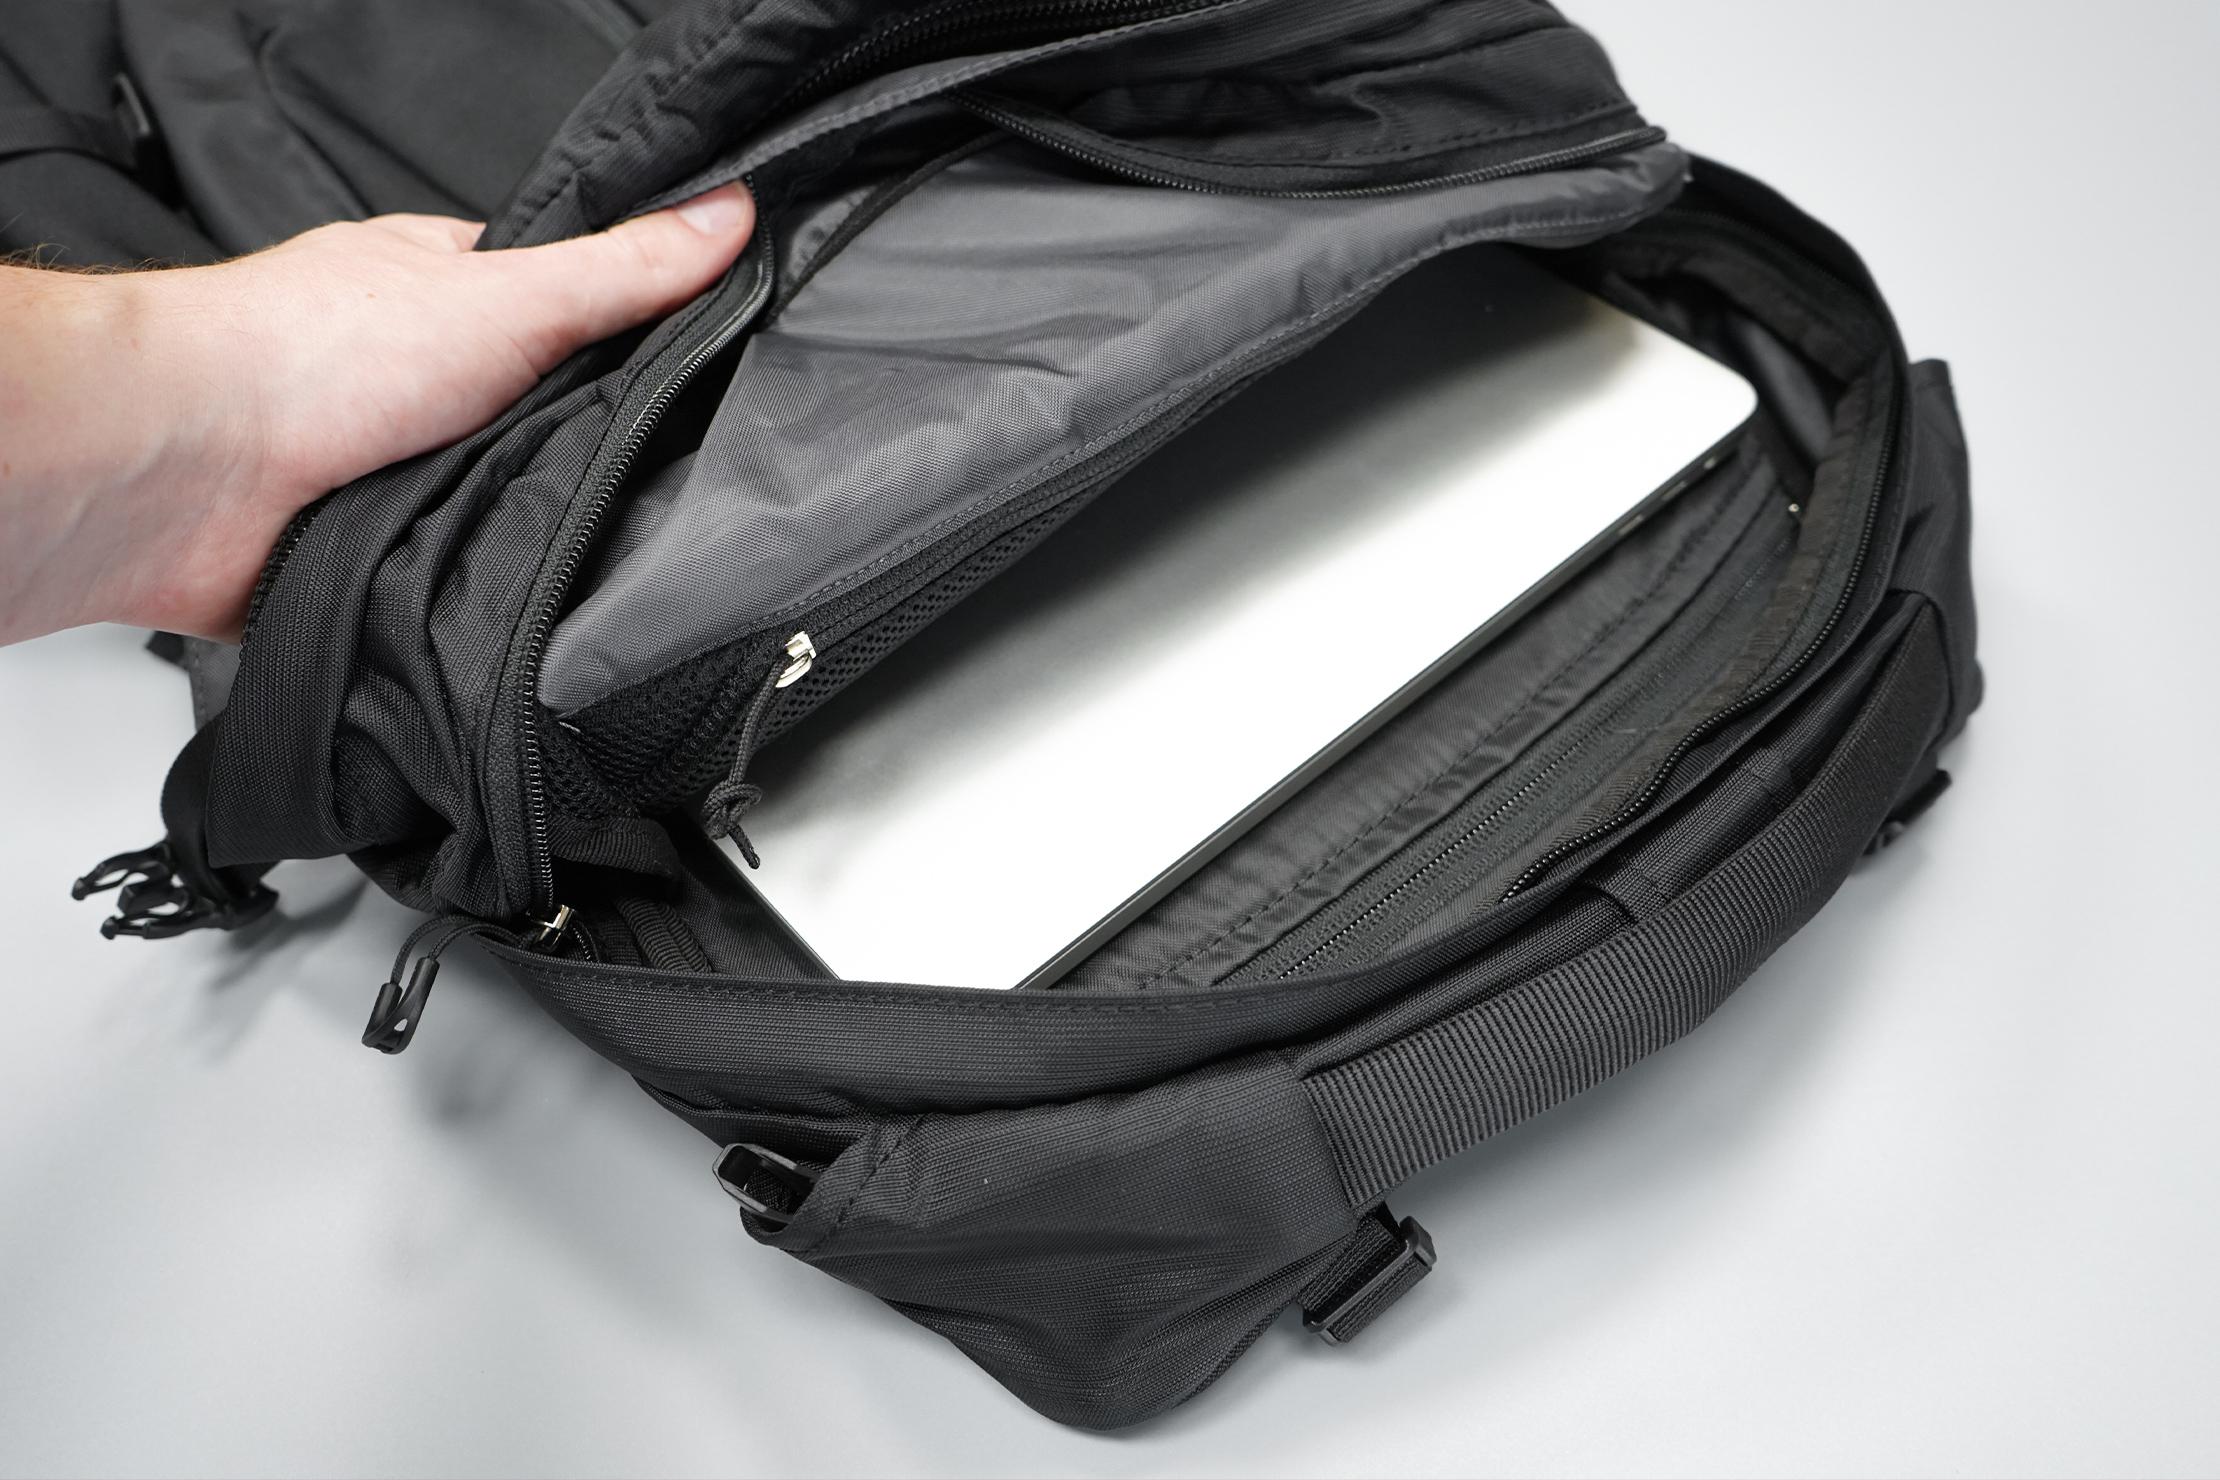 Osprey Tropos Laptop Compartment